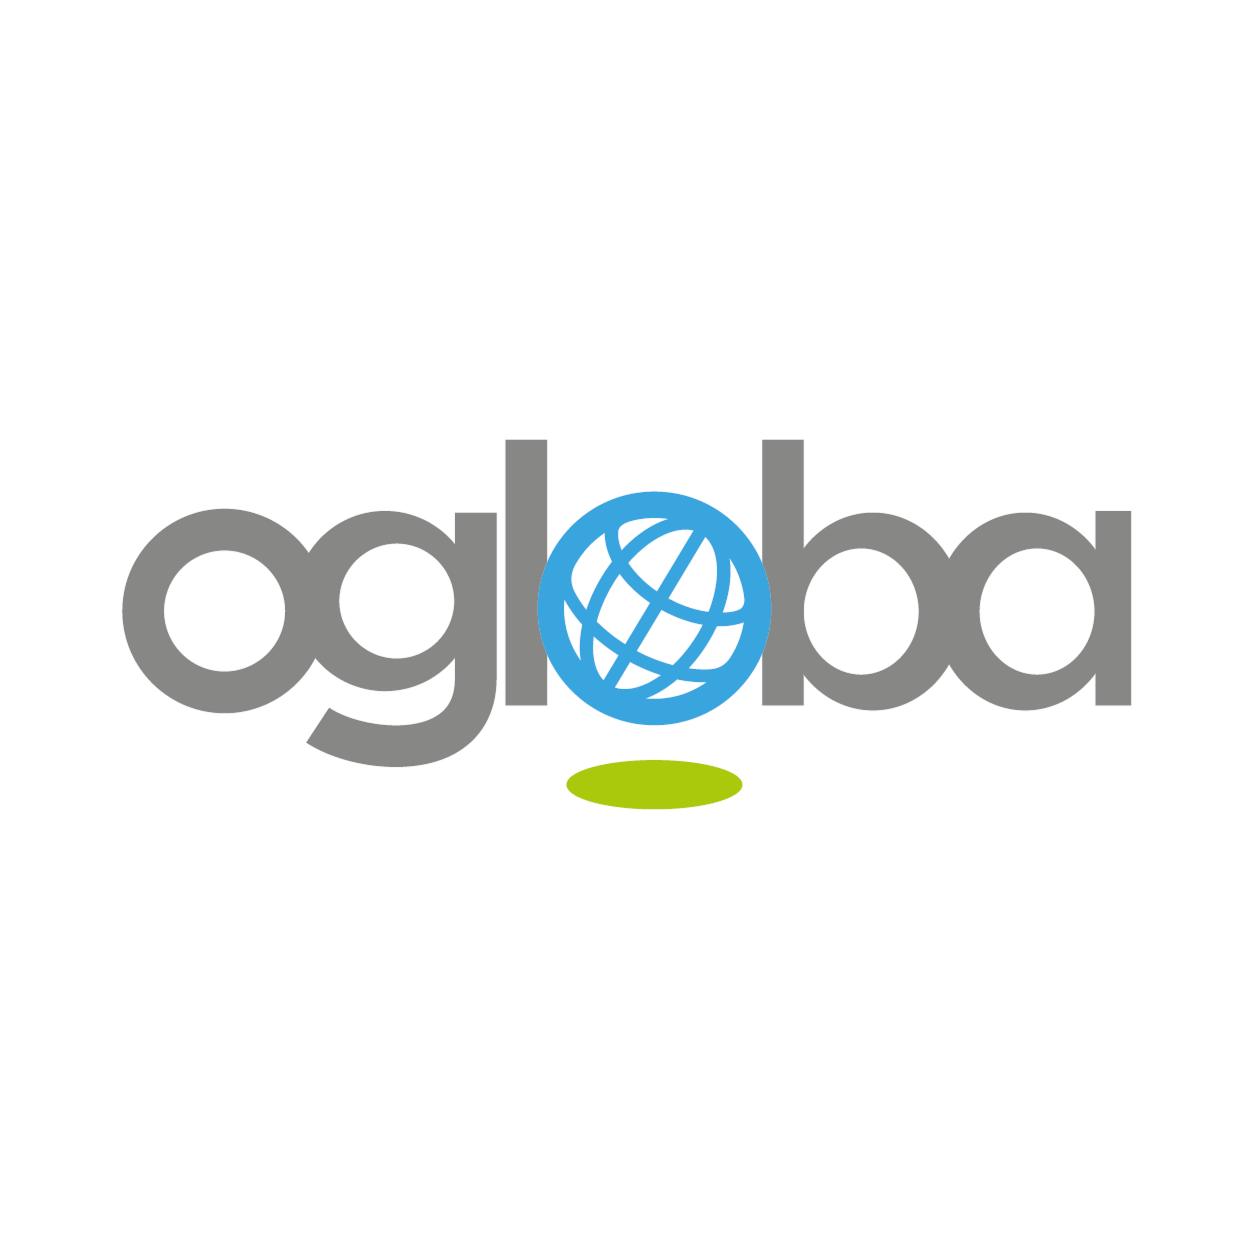 Ogloba Ltd